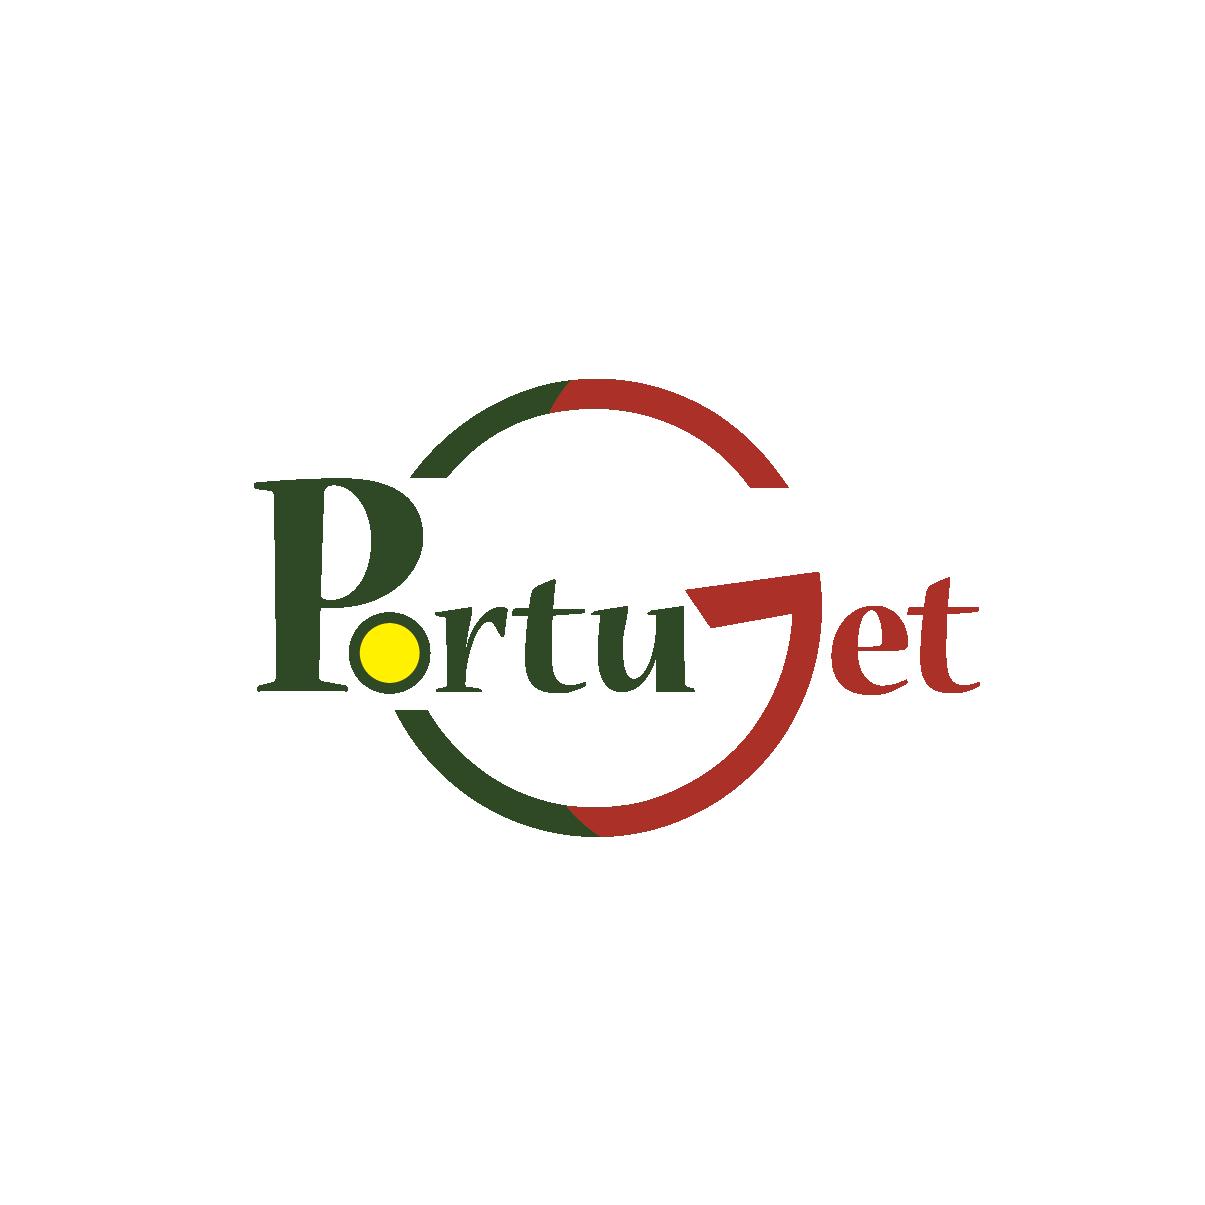 portuget_final-01.png